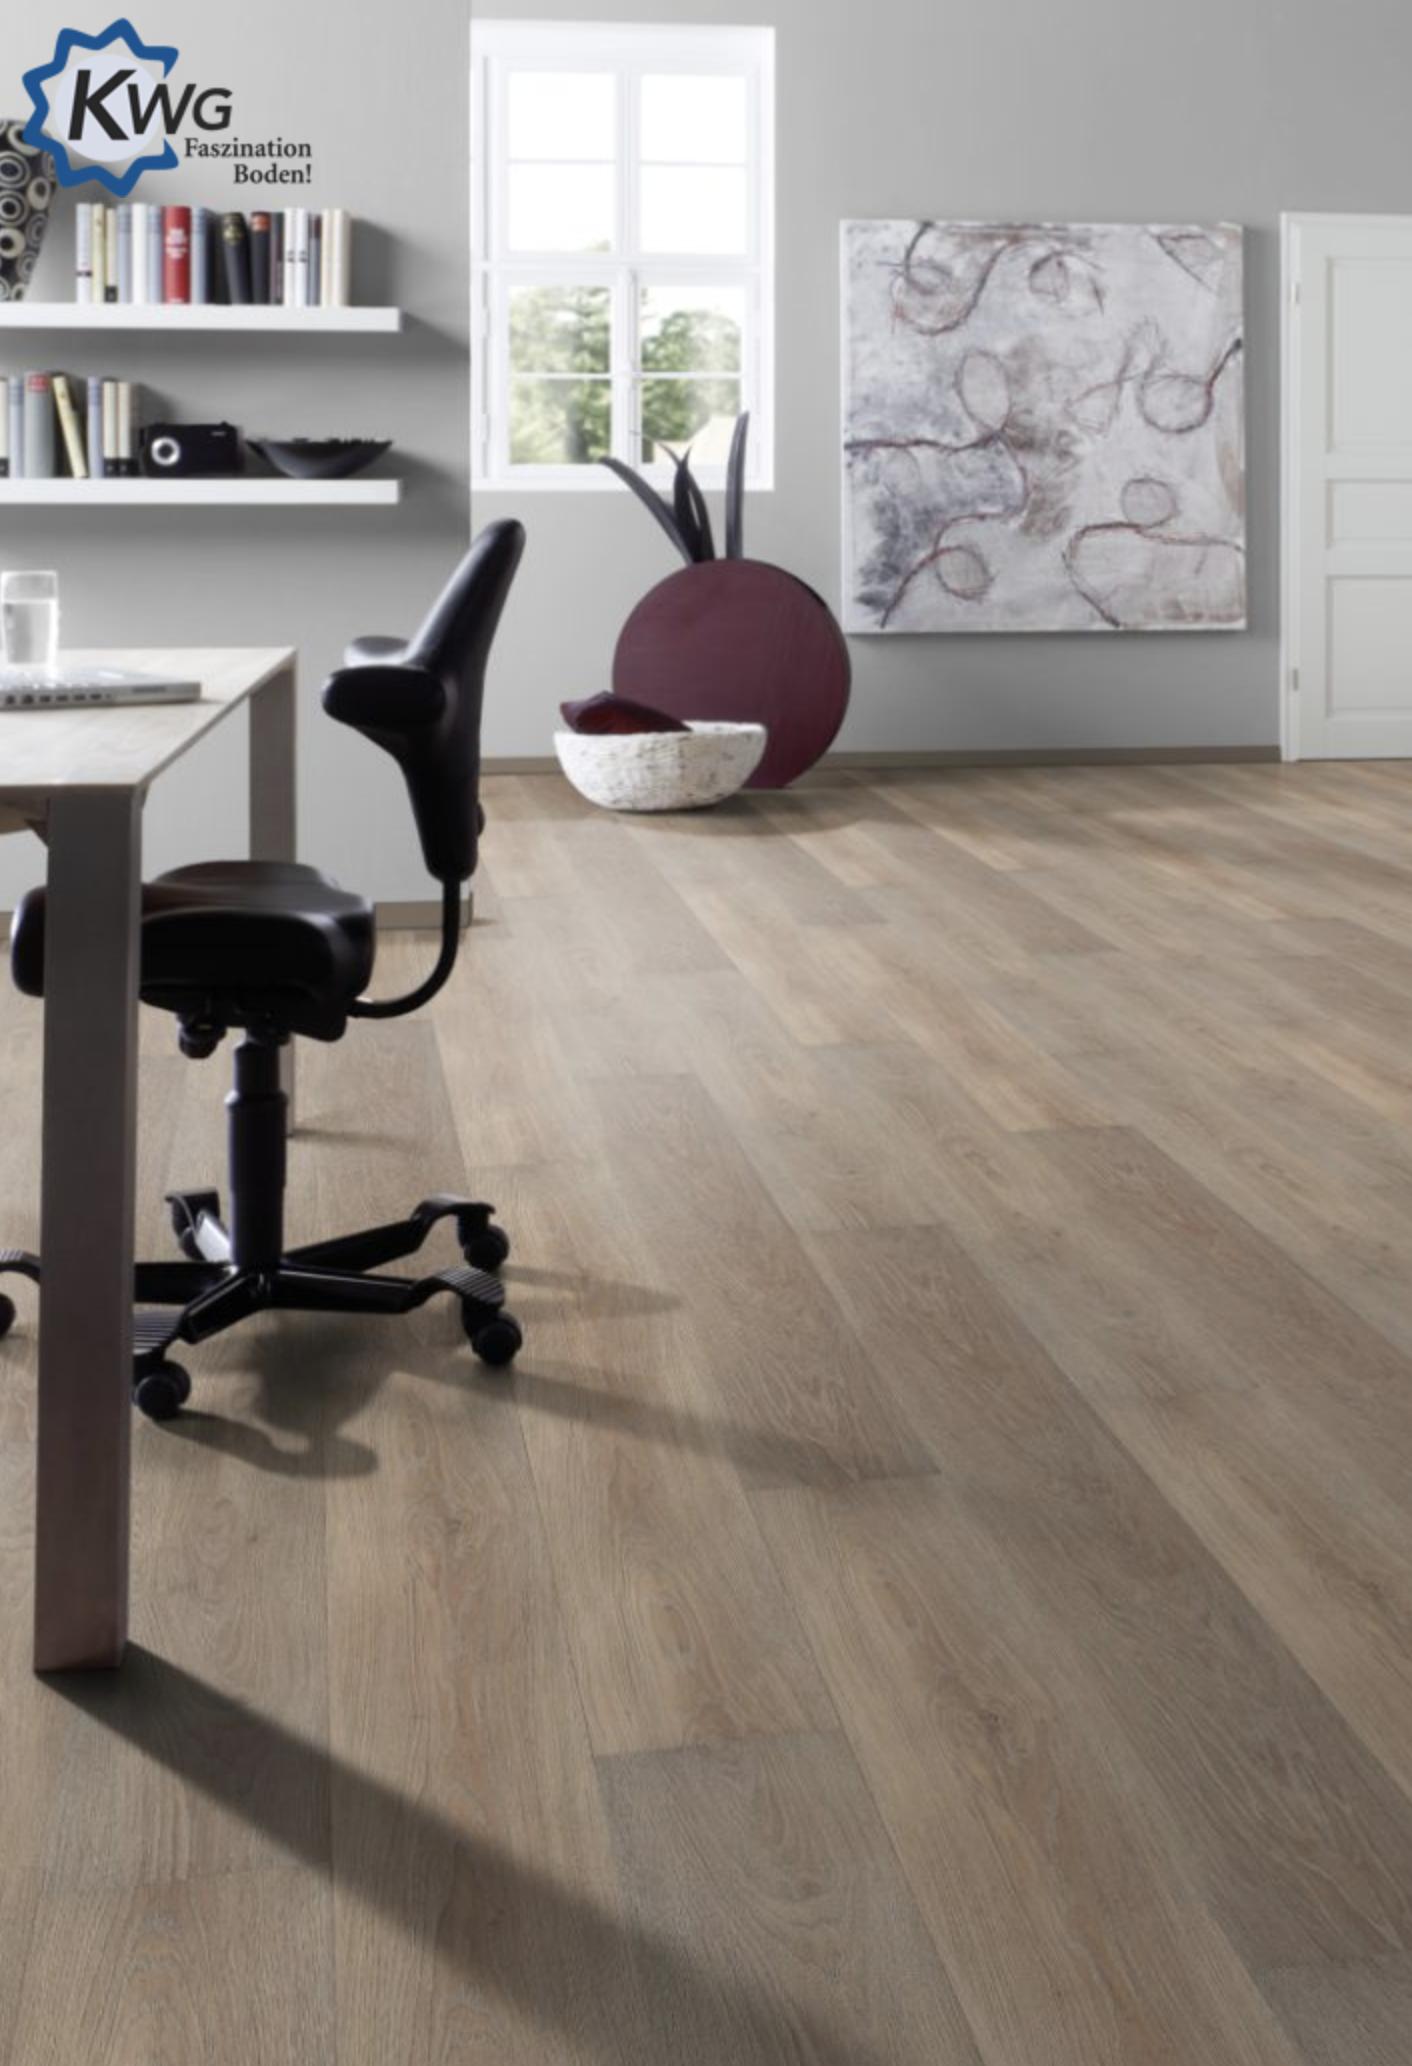 Vinylboden und Design-Vinylboden   Vinylboden in 2019 ...